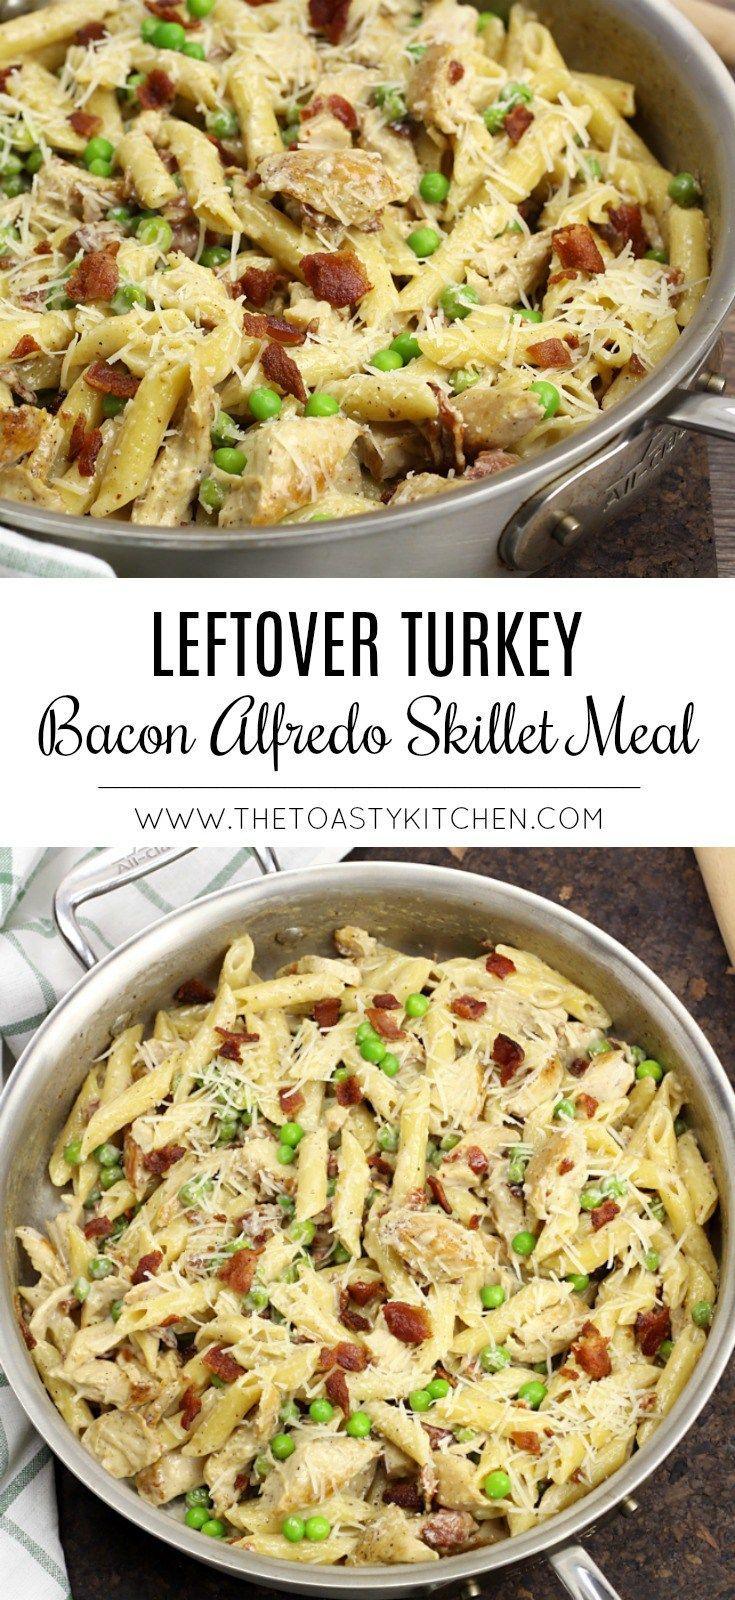 Leftover Turkey Alfredo Skillet Meal - The Toasty Kitchen